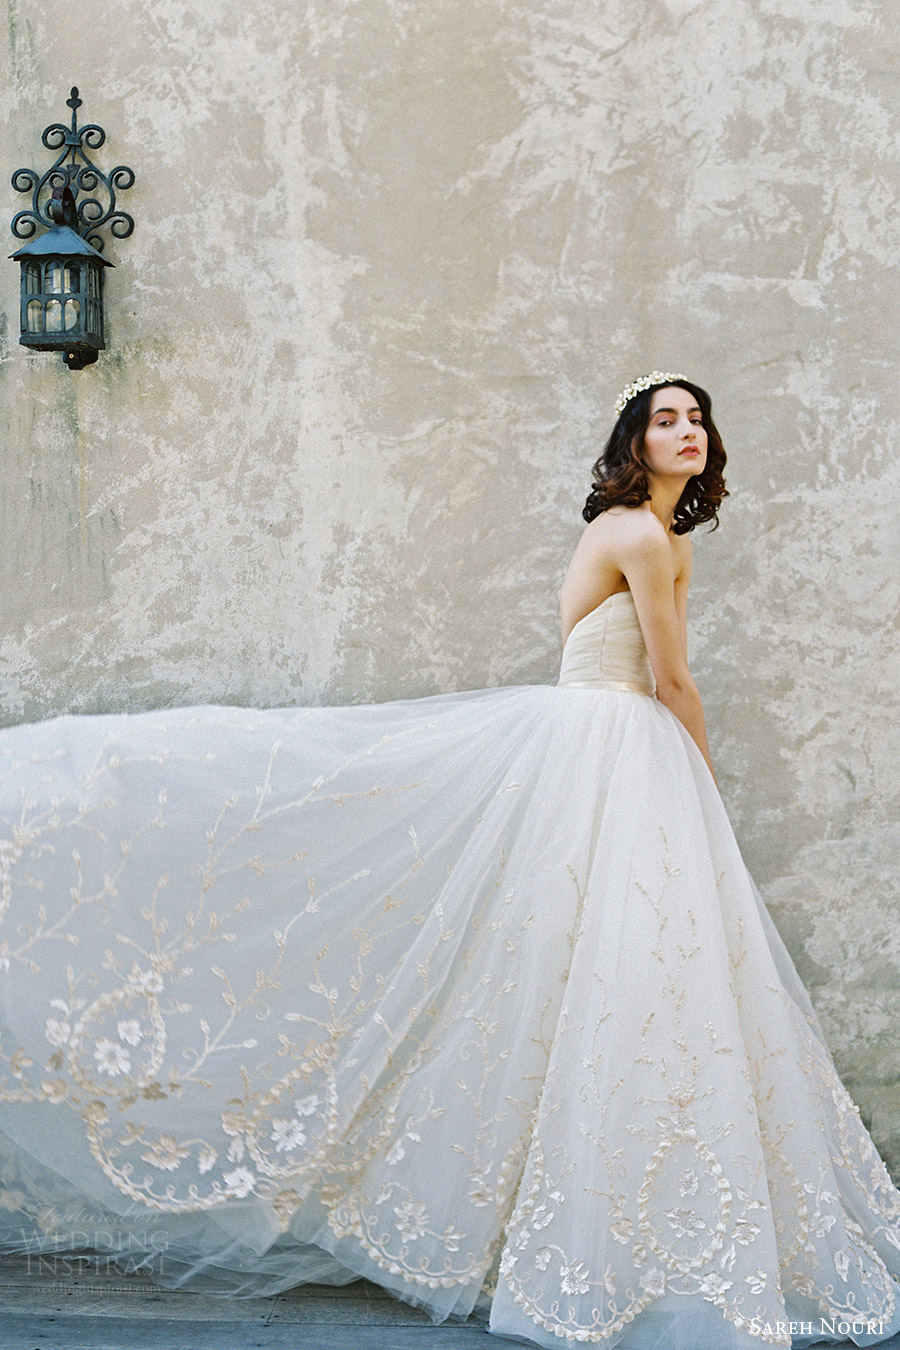 sareh nouri bridal spring 2017 strapless straightacross ball gown wedding dress (ivy) fv